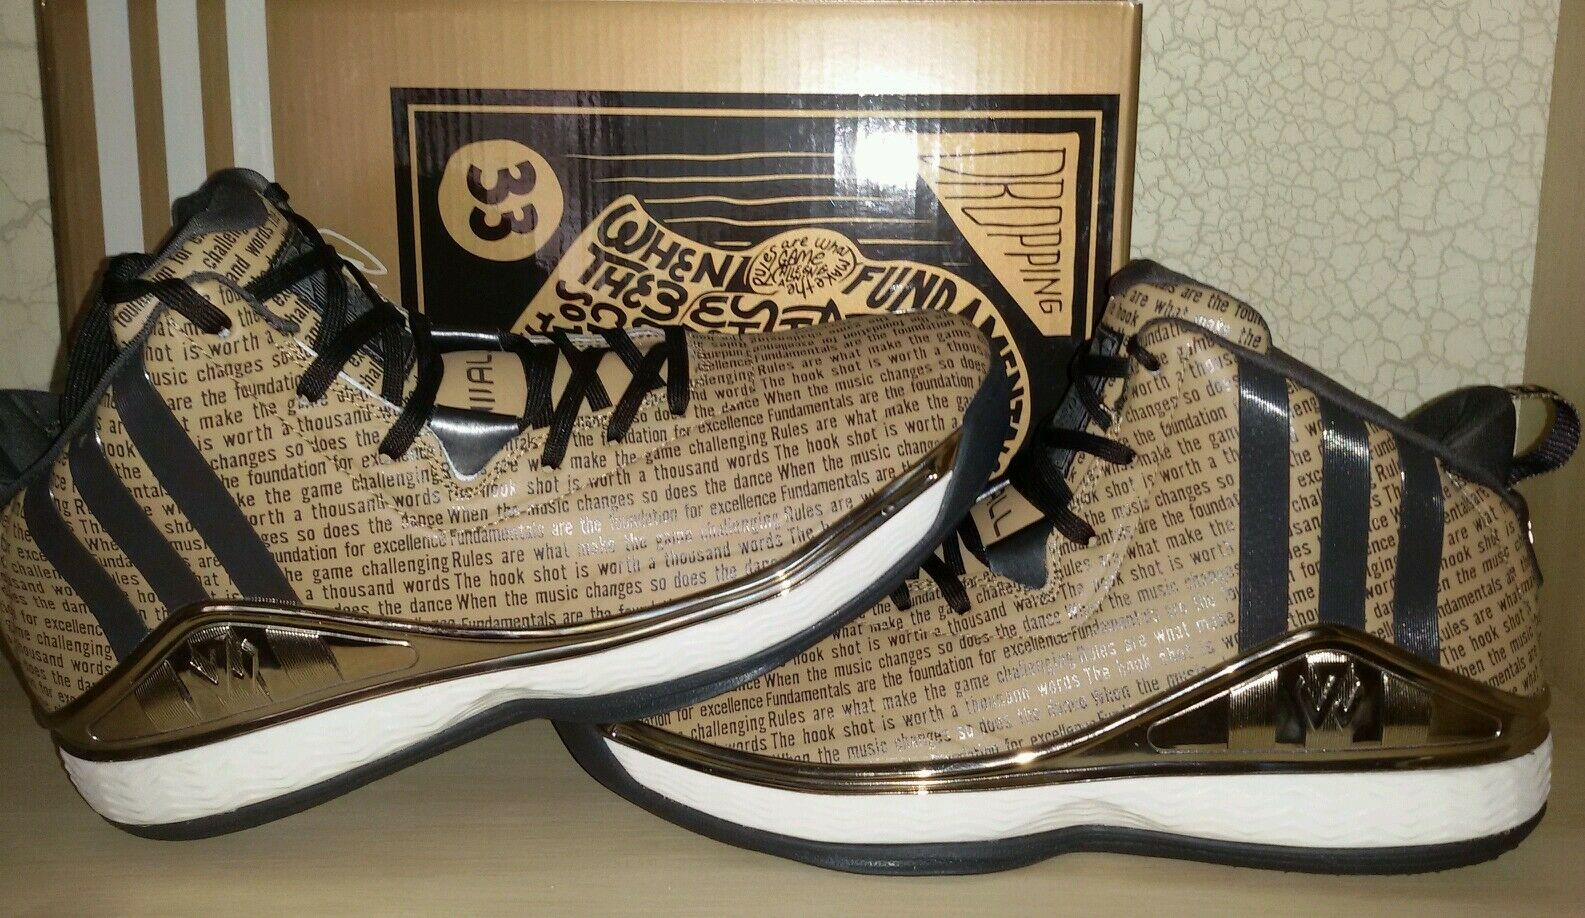 sports shoes 4b998 6d92b discount code for adidas mann blau adidas braun af3c06 107cb deb92  hot  adidas john wall 1 bhm schwarz history month bhm 1 karton braun d68946 j e  rose